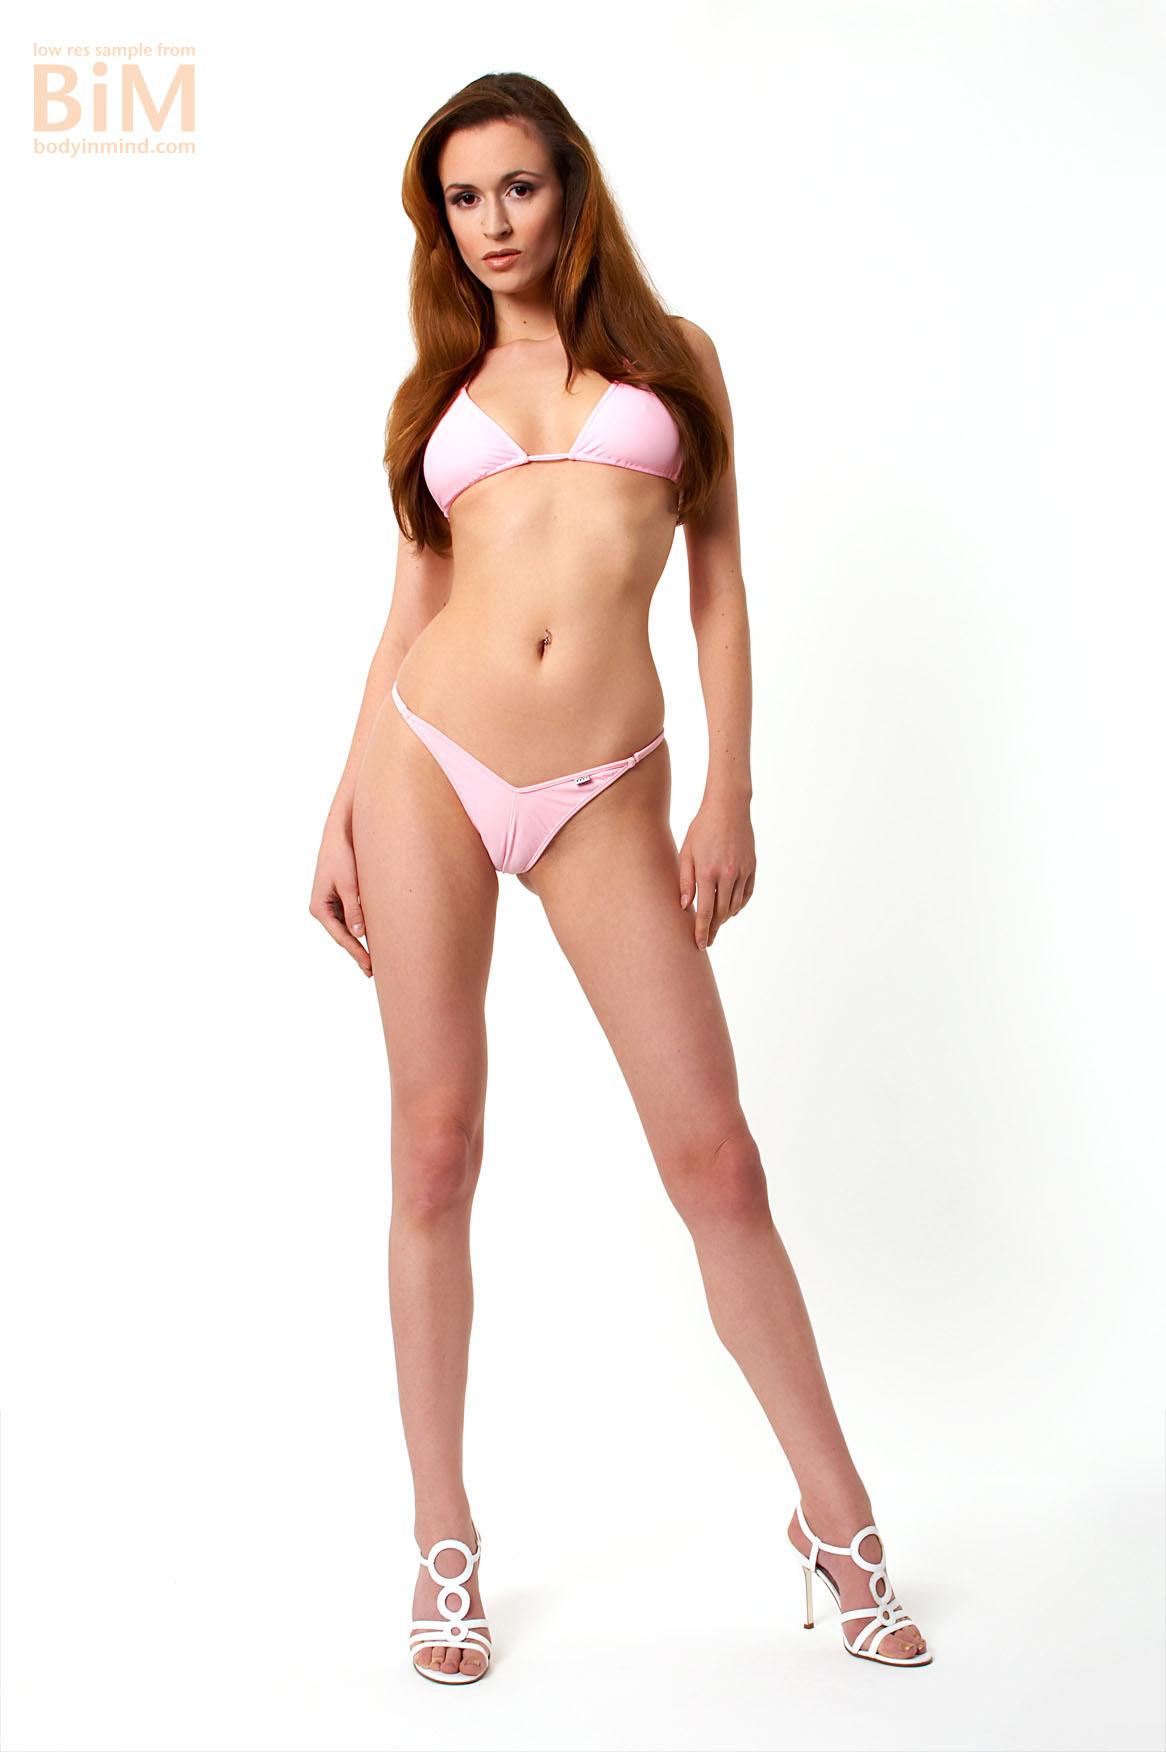 Anna Big Boobs Pink Bikini and high Heels for Body in Mind